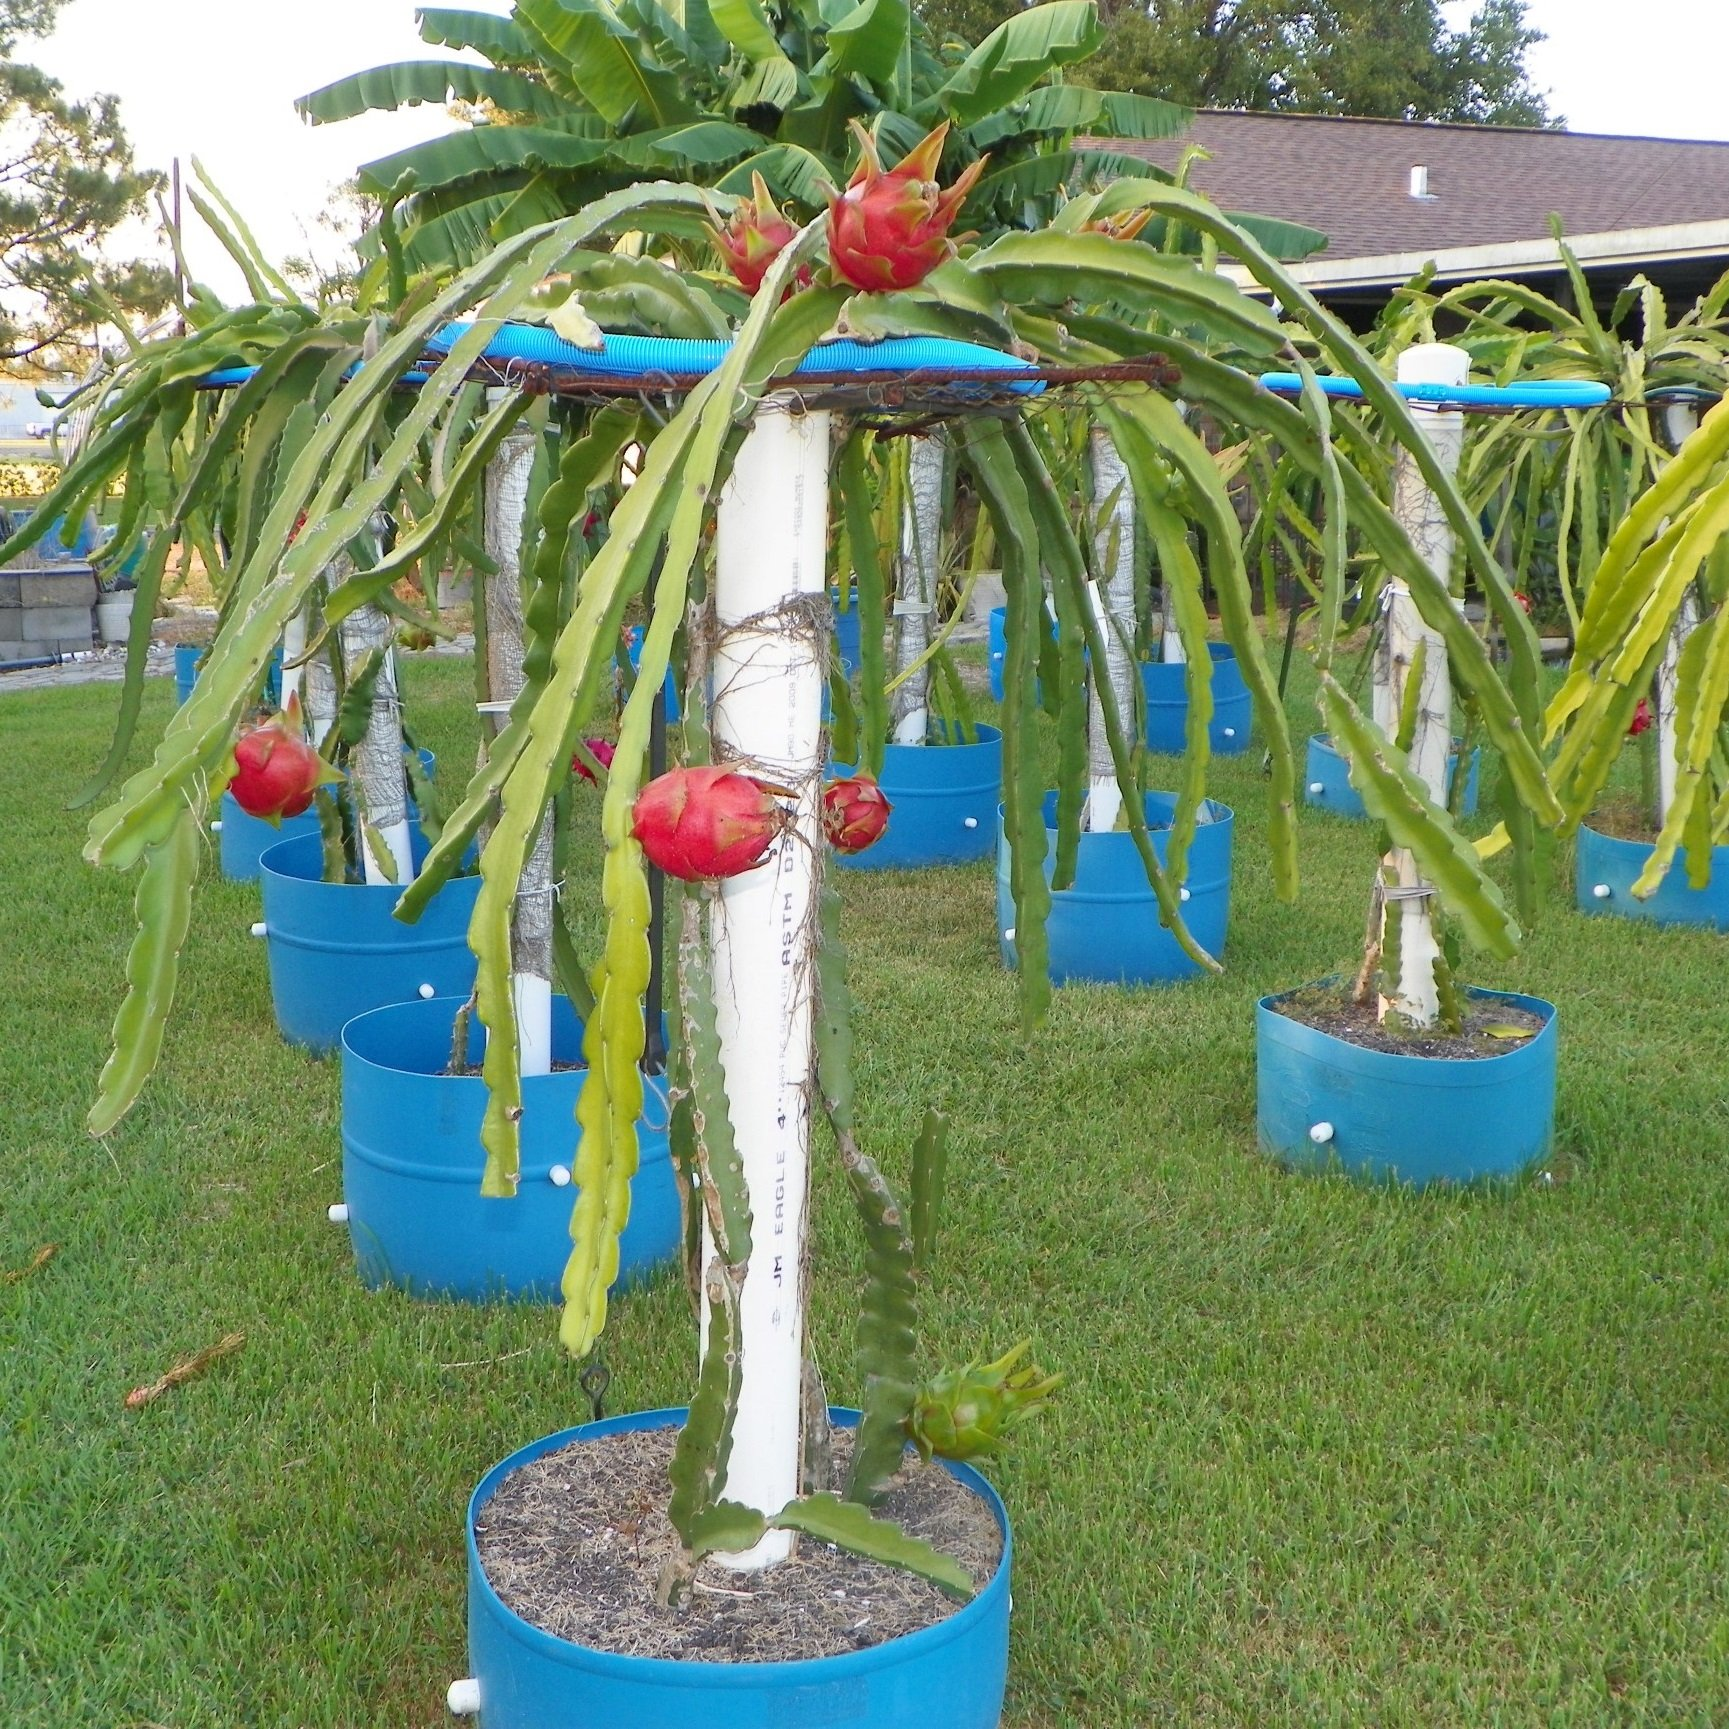 Dragon Fruit variety Halleys Comet plant